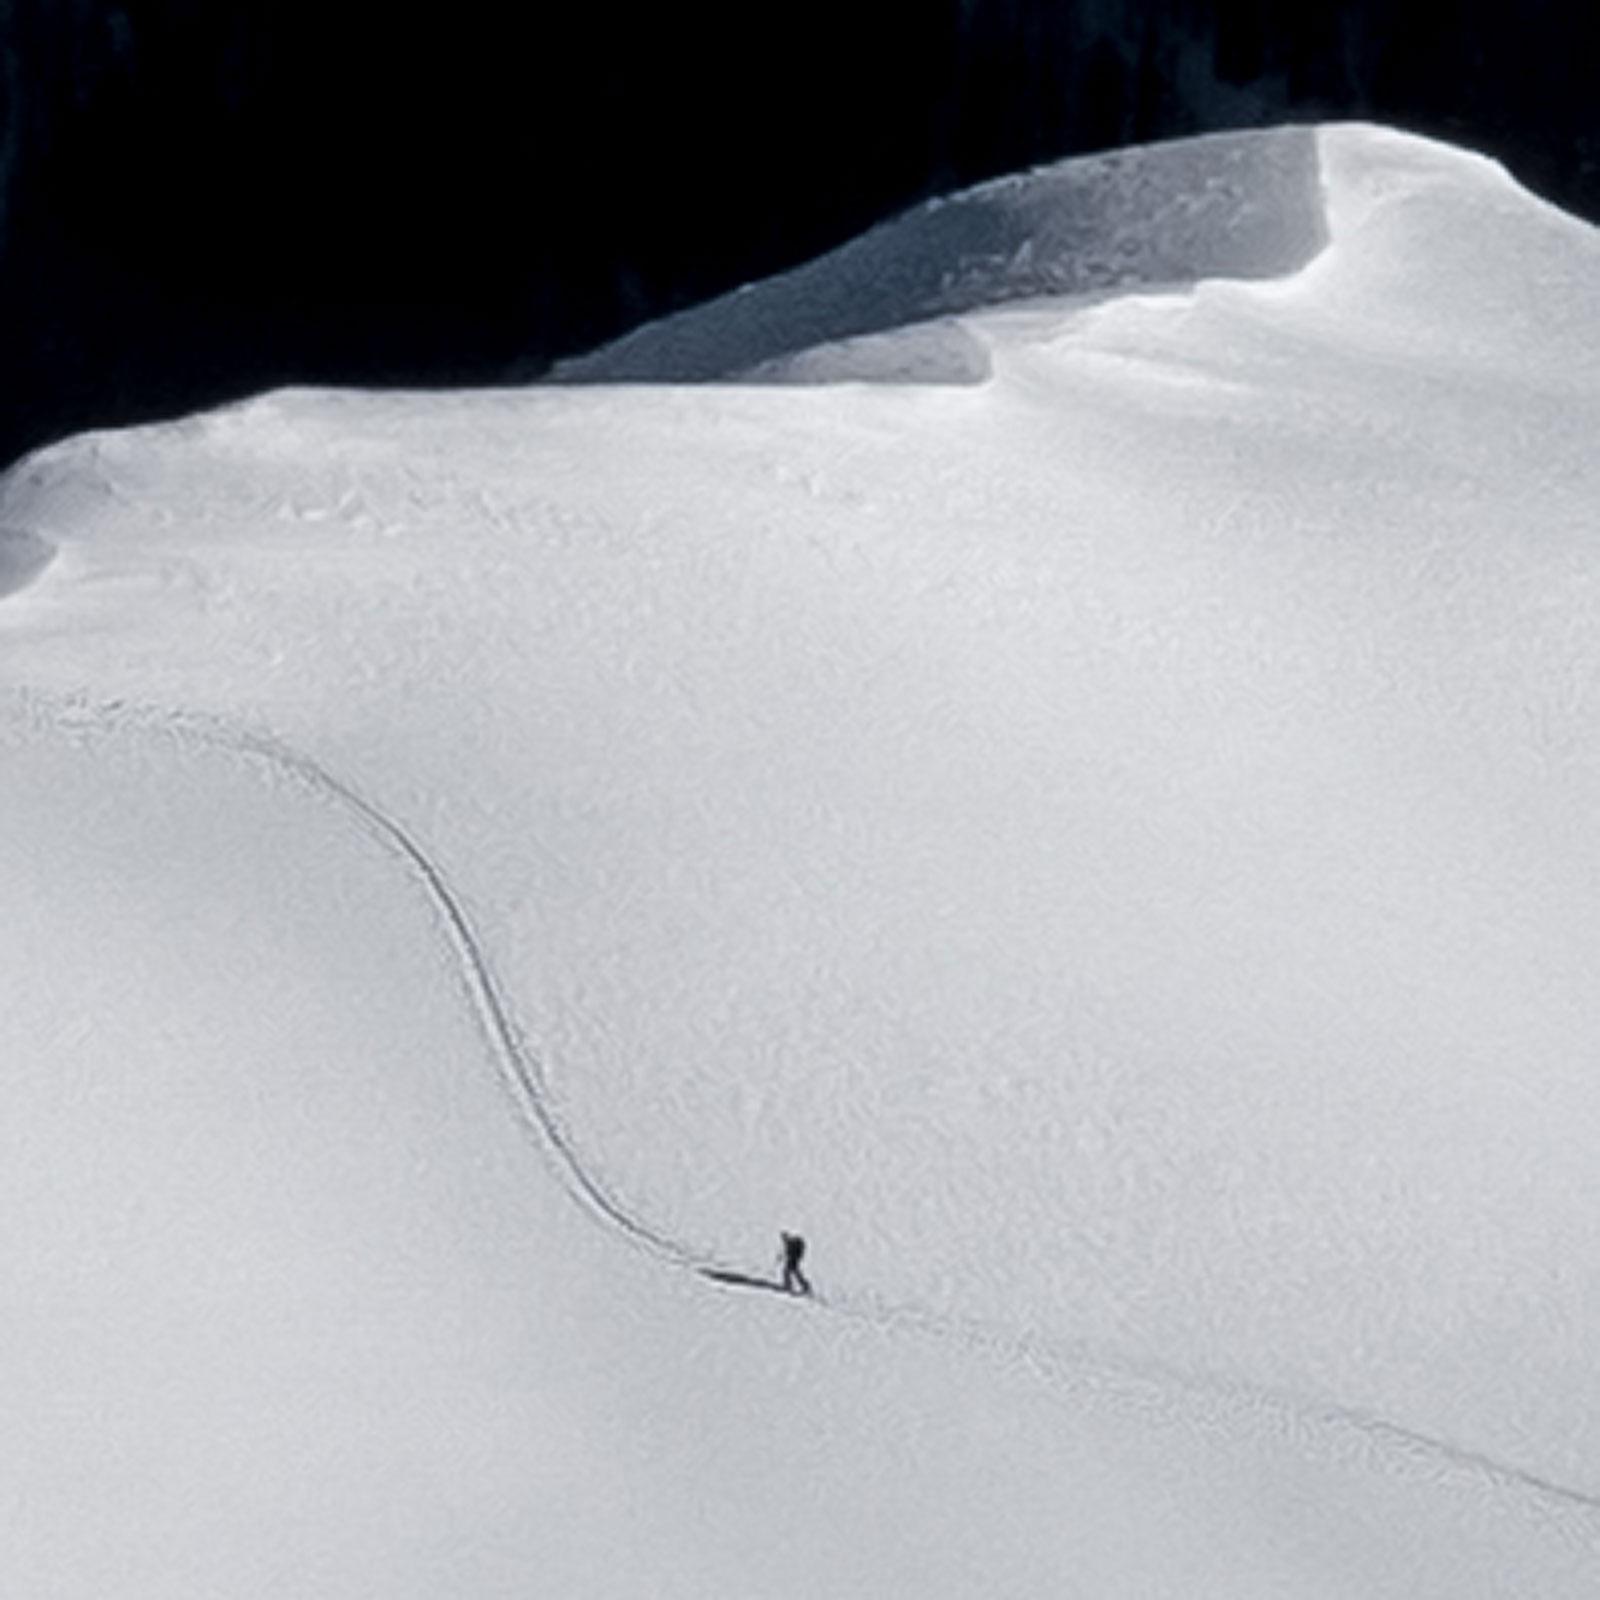 Kurve. Skitour | Pauli Trenkwalder, Berge & Psychologie